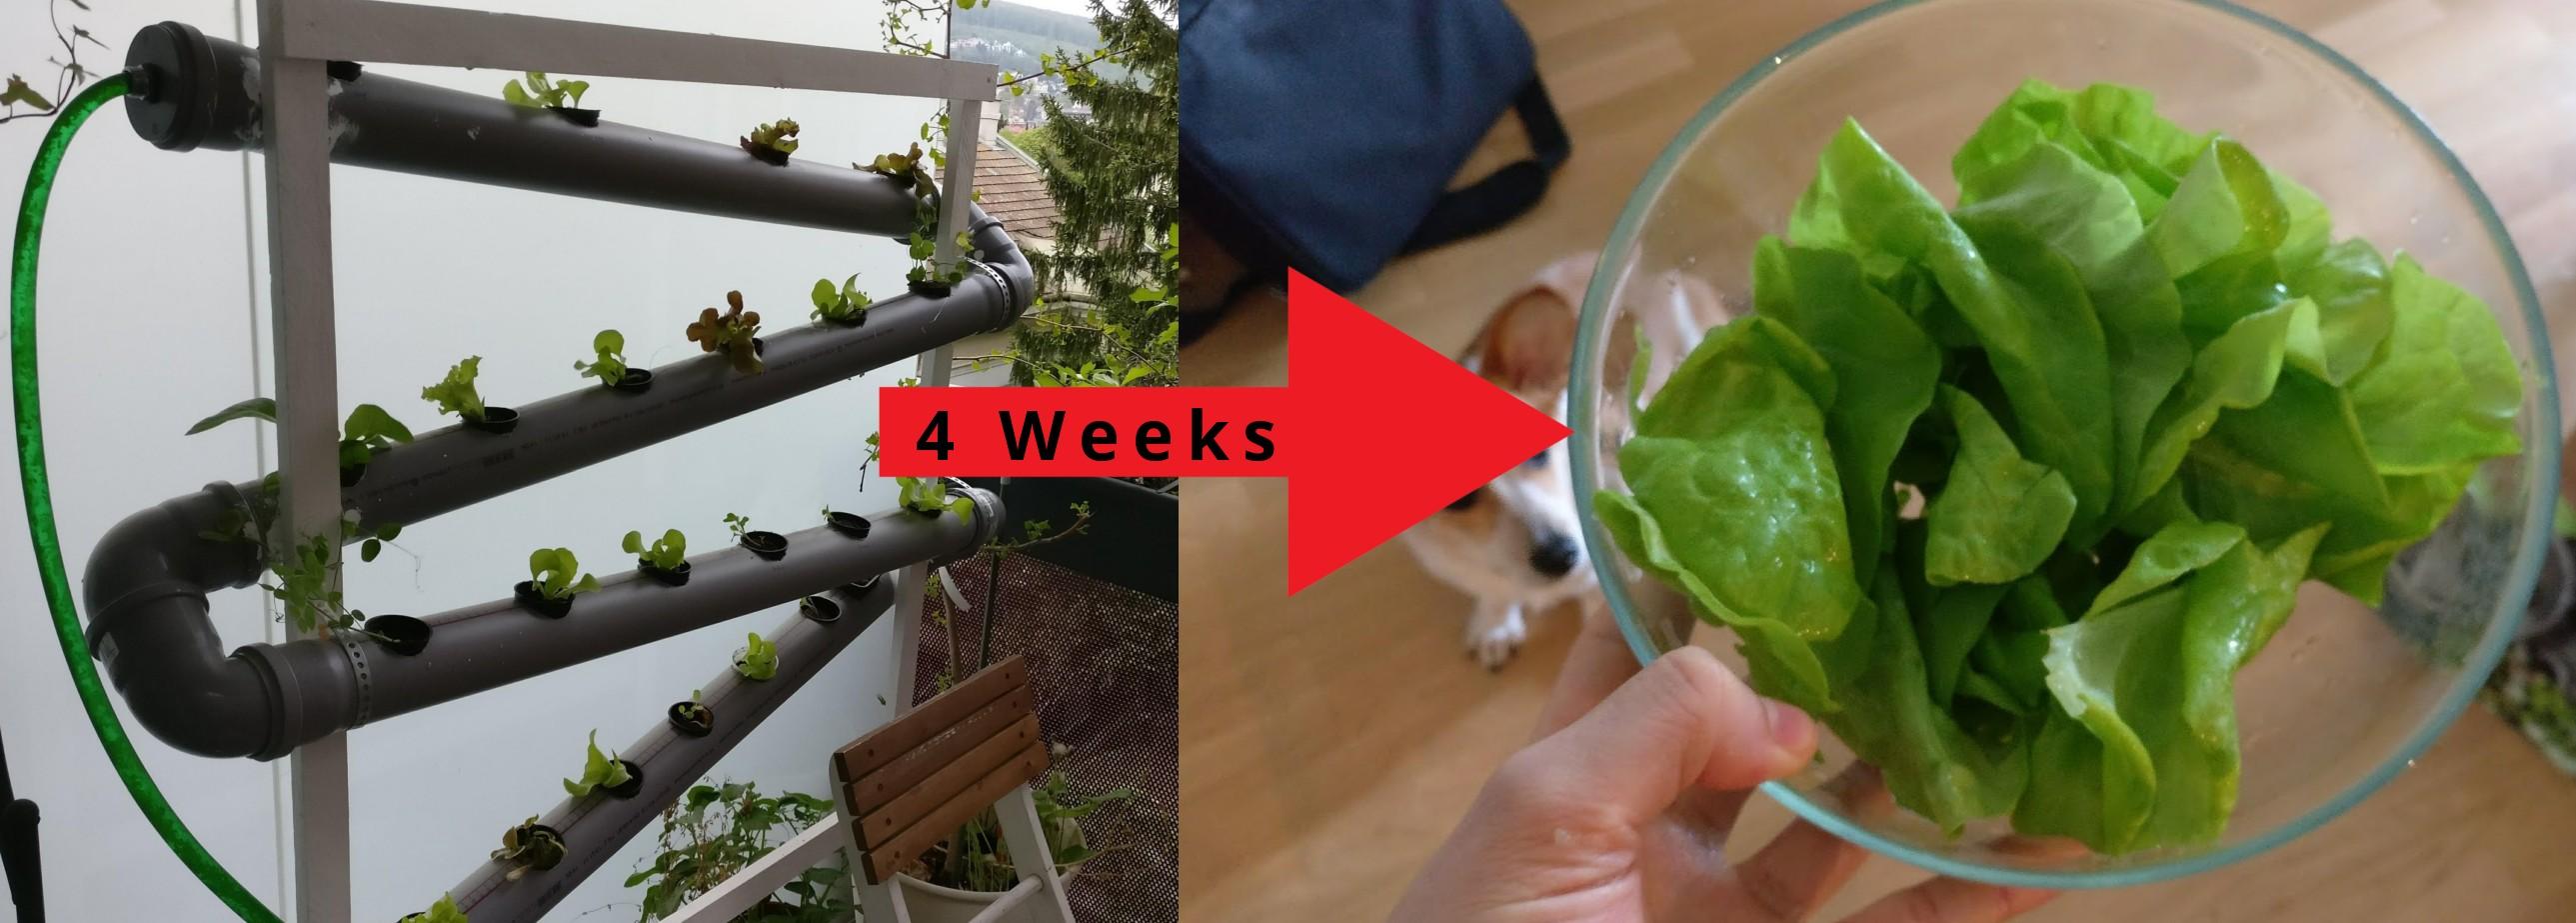 DIY vertical hydroponic system